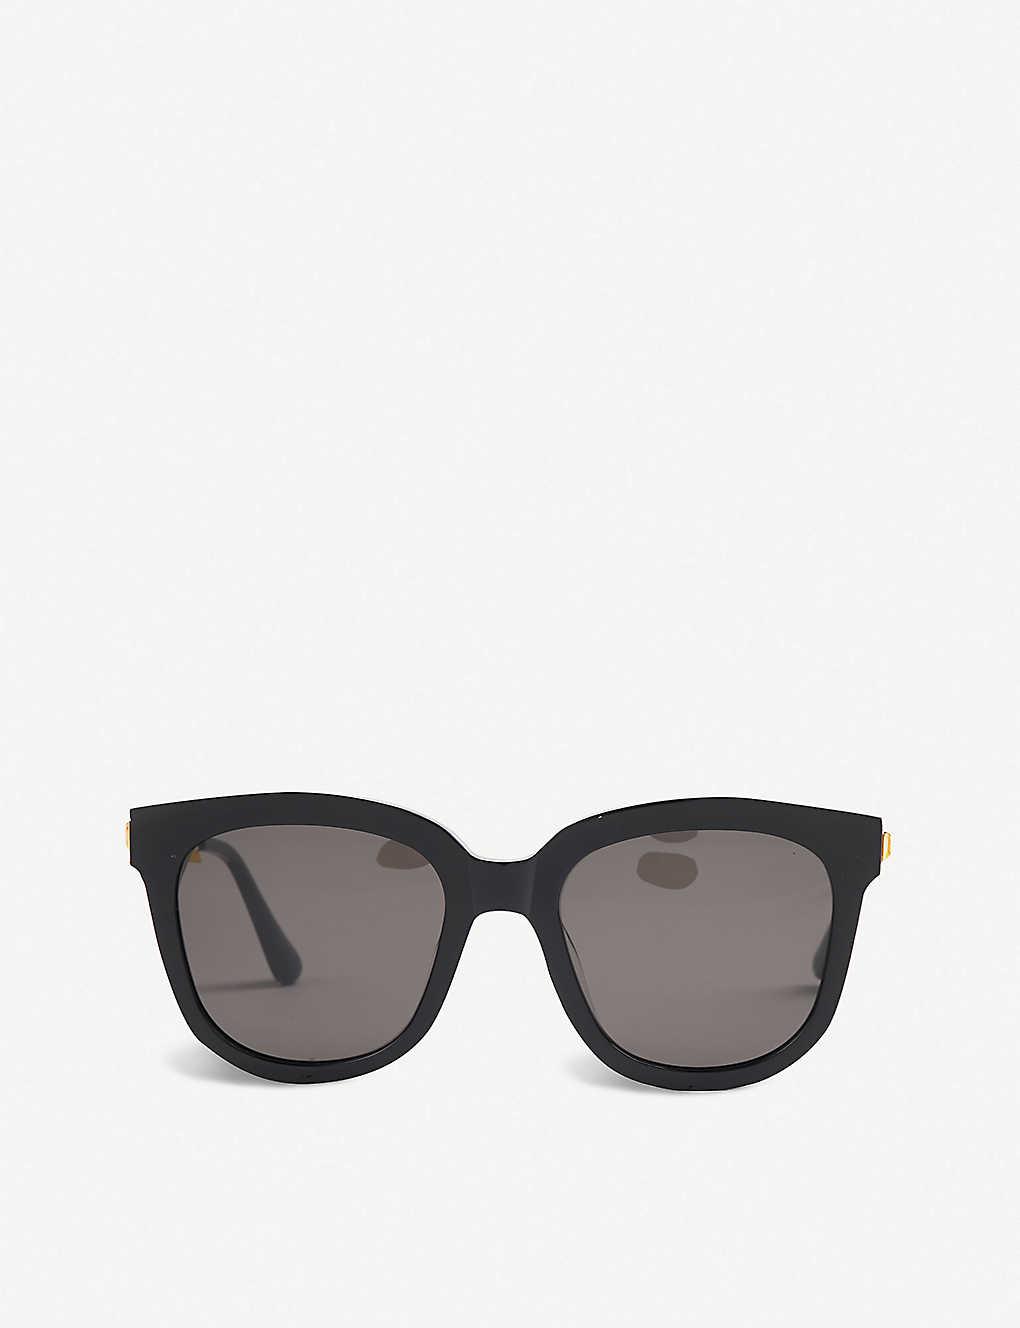 cbb4a6e727 GENTLE MONSTER Absente acetate sunglasses